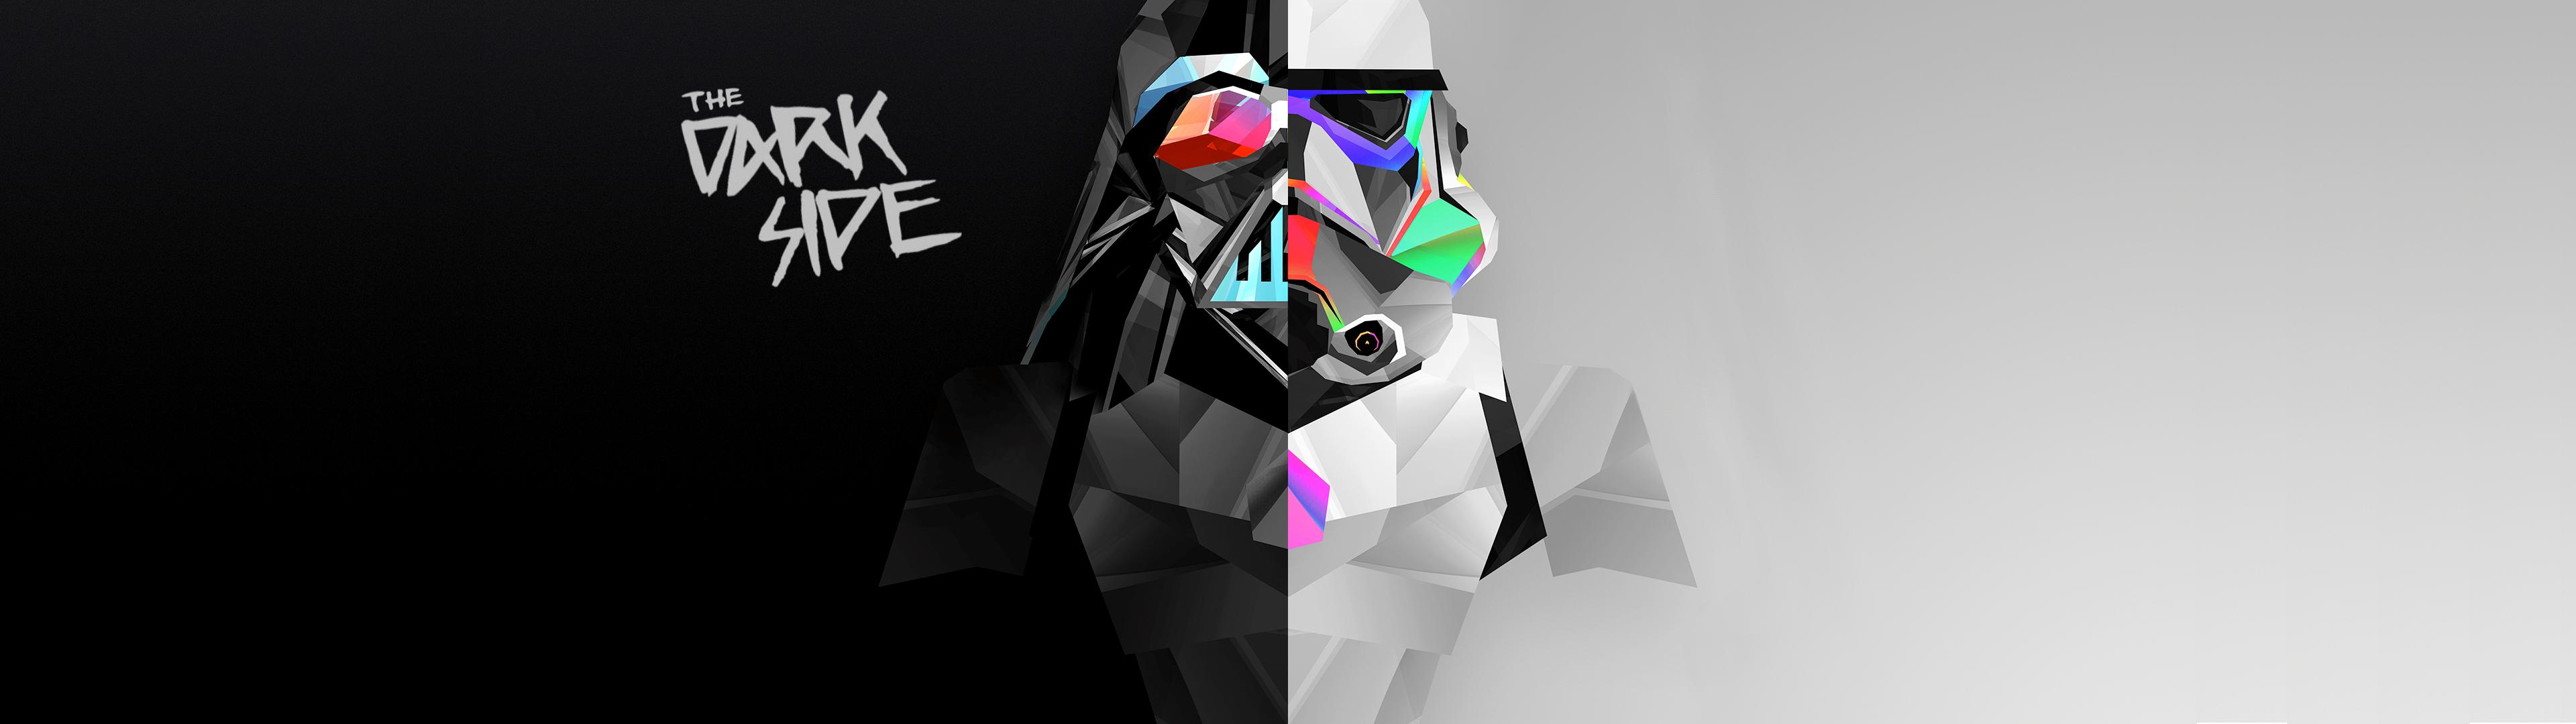 Wallpaper Multiple Display Dual Monitors Abstract Digital Art Stormtrooper Darth Vader Dark Side Star Wars 3840x1080 Velian 1257633 Hd Wallpapers Wallhere